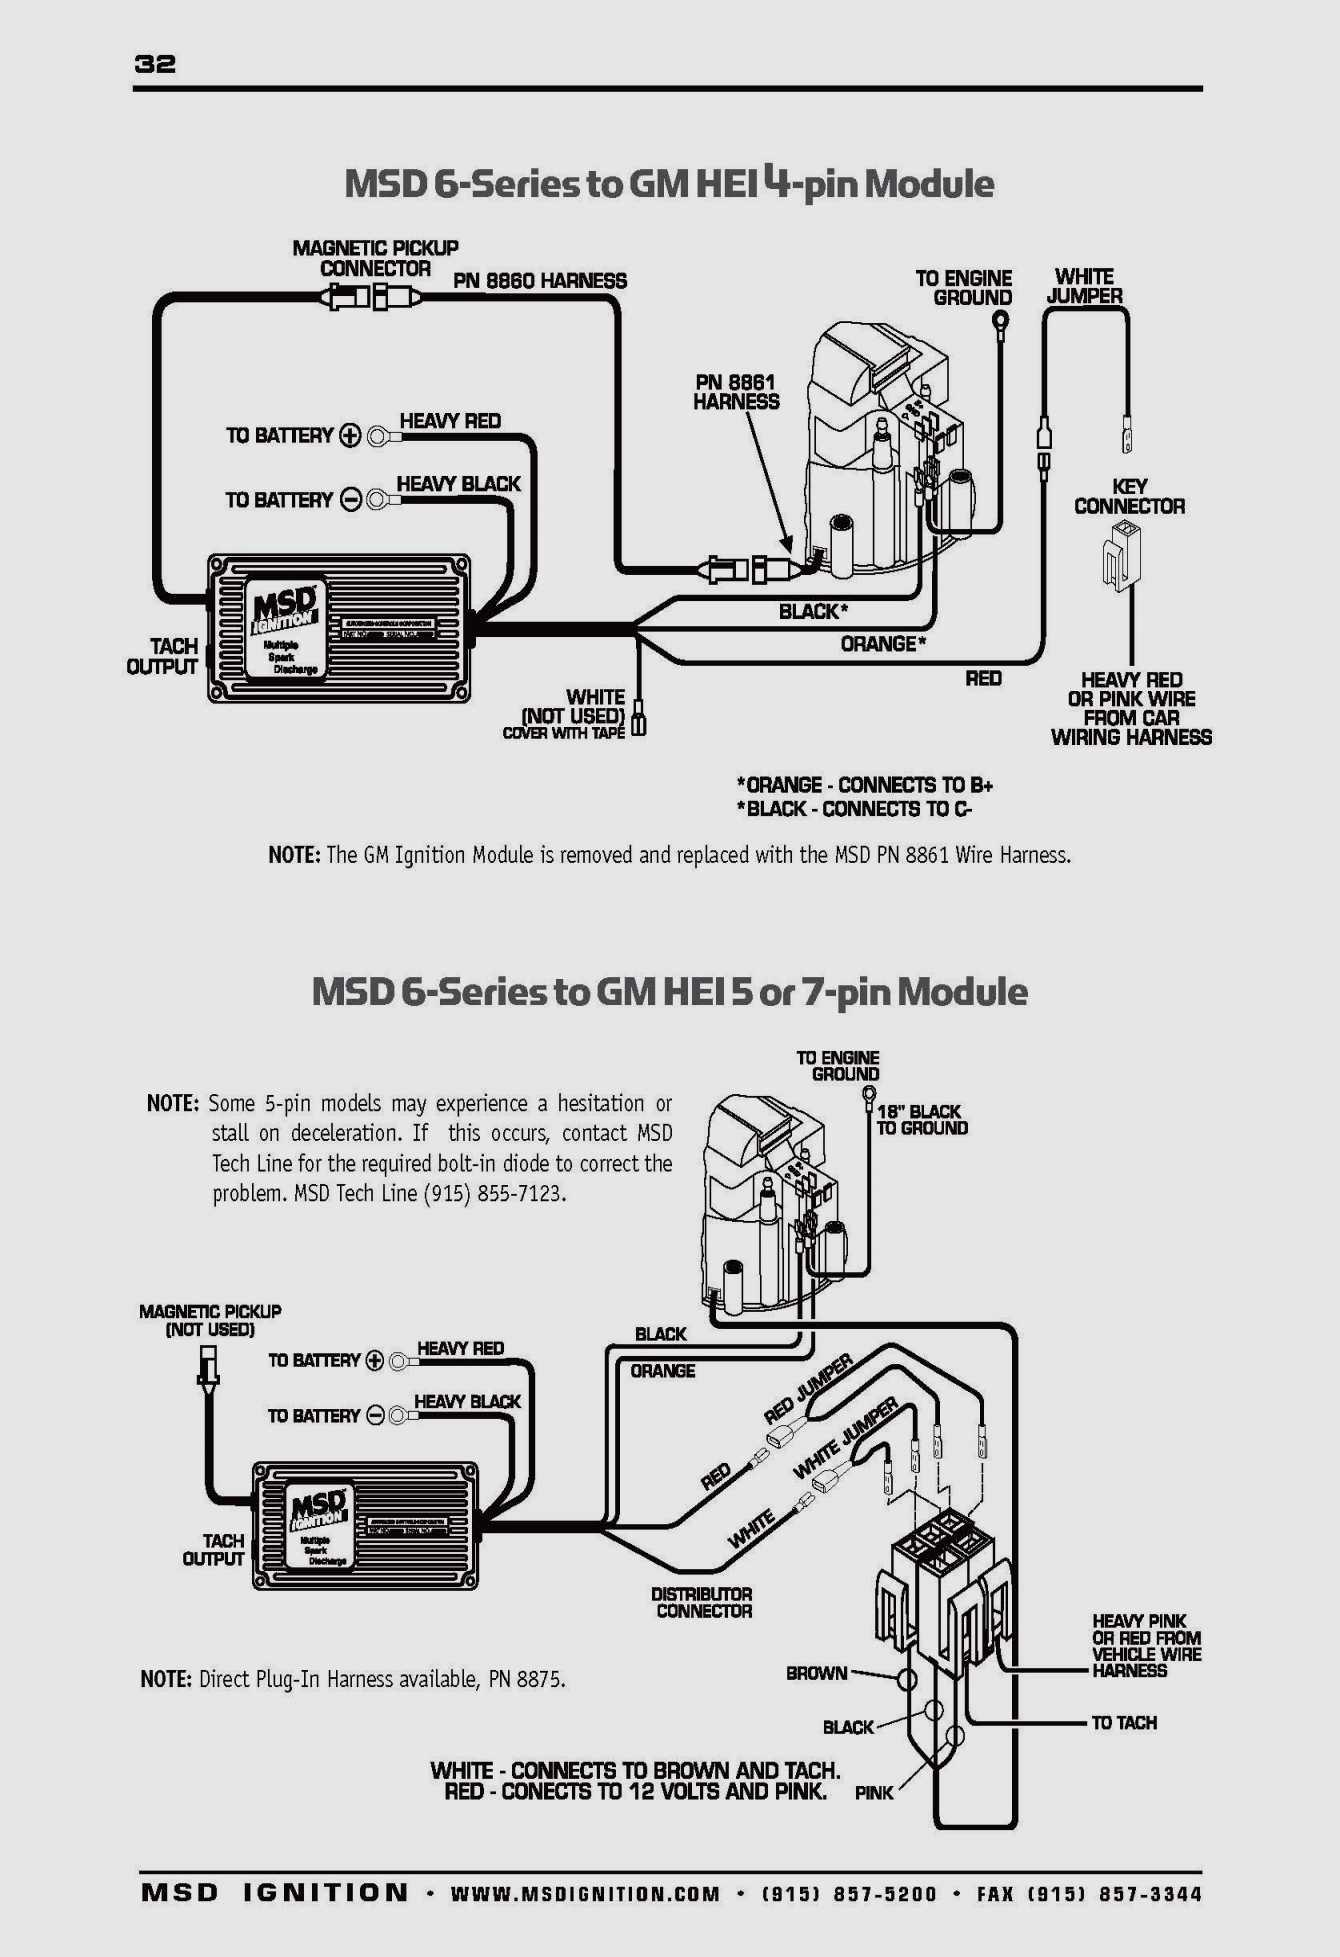 Msd 6Al Wiring Diagram Comp 9000 Mallery | Wiring Diagram - Msd 6Al Wiring Diagram